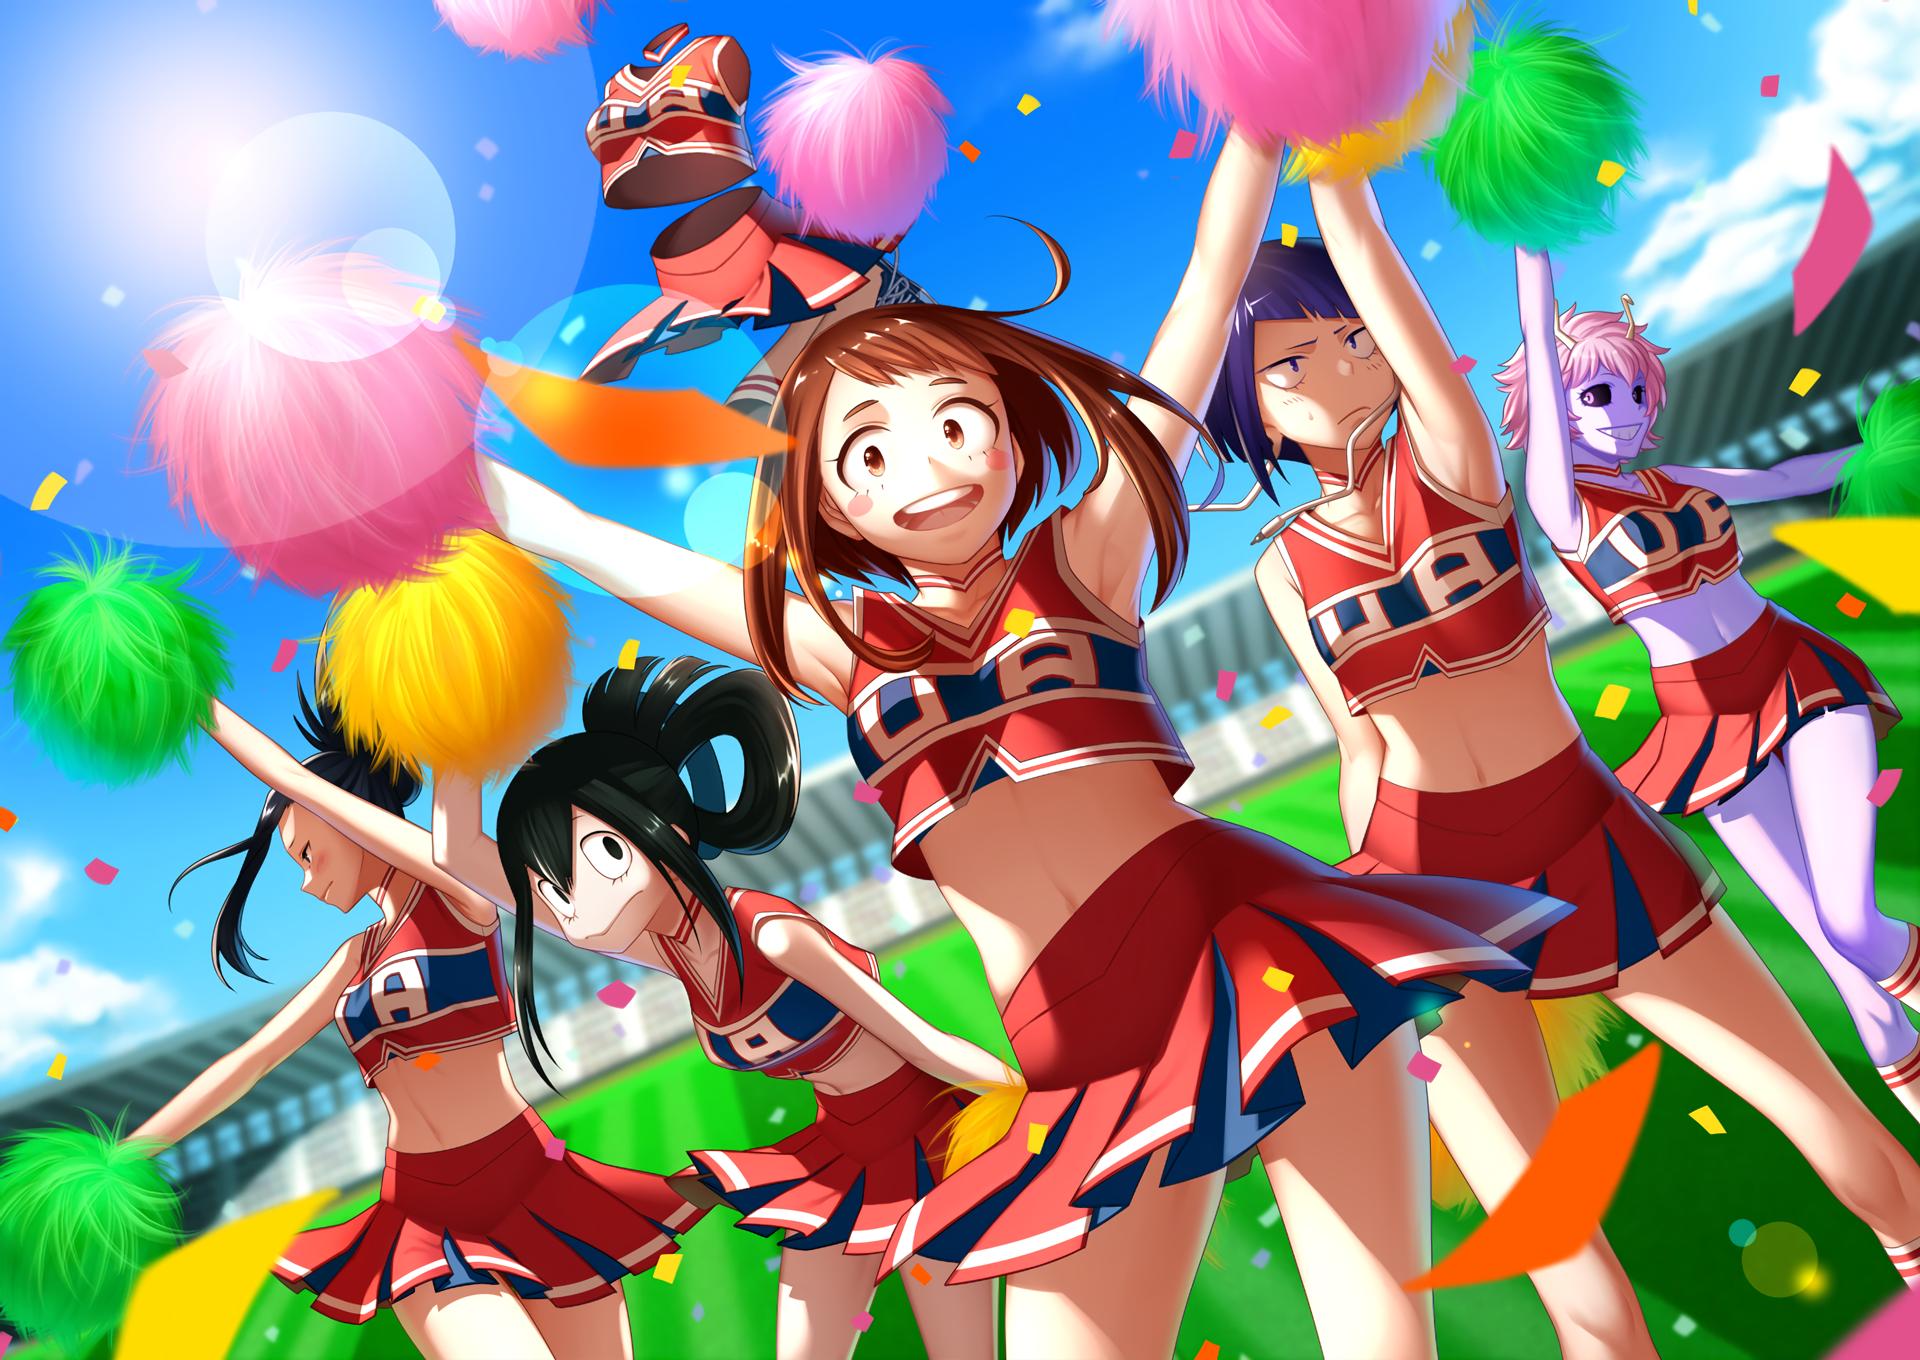 Anime 1920x1360 Boku no Hero Academia colorful anime anime girls cheerleaders